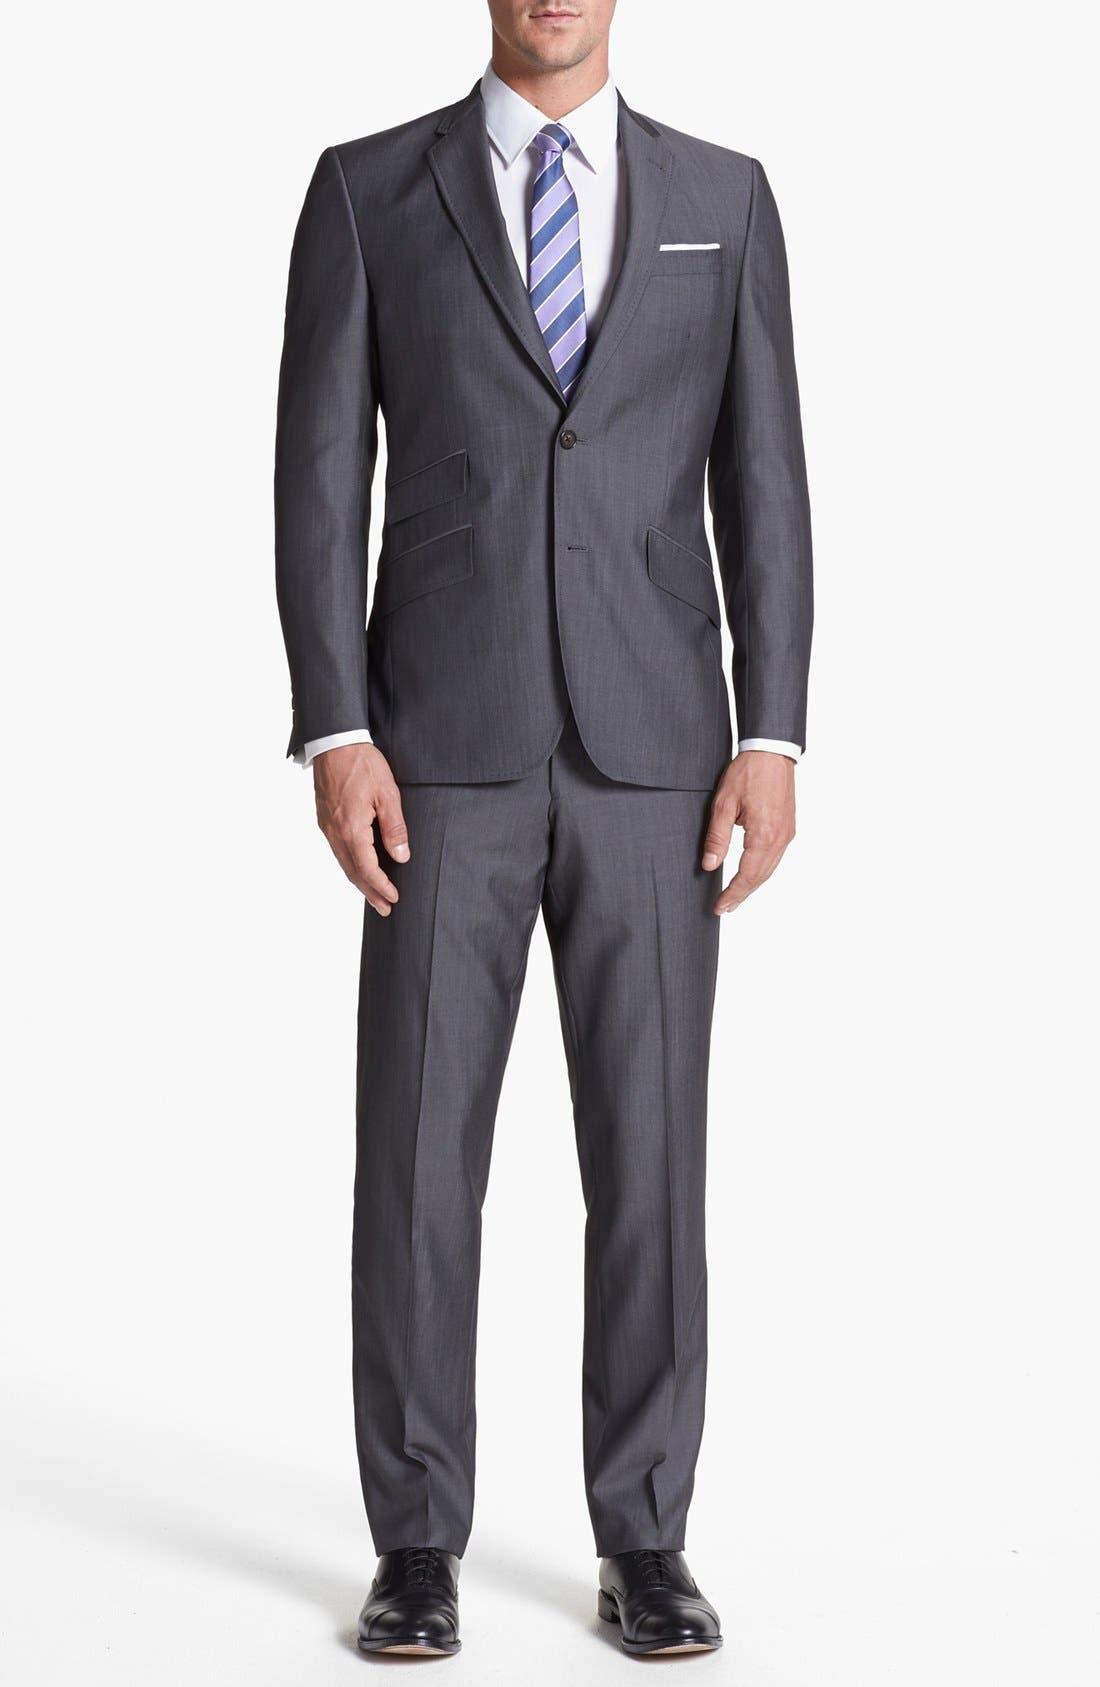 Alternate Image 1 Selected - Ted Baker London 'Jim' Grey Wool Suit